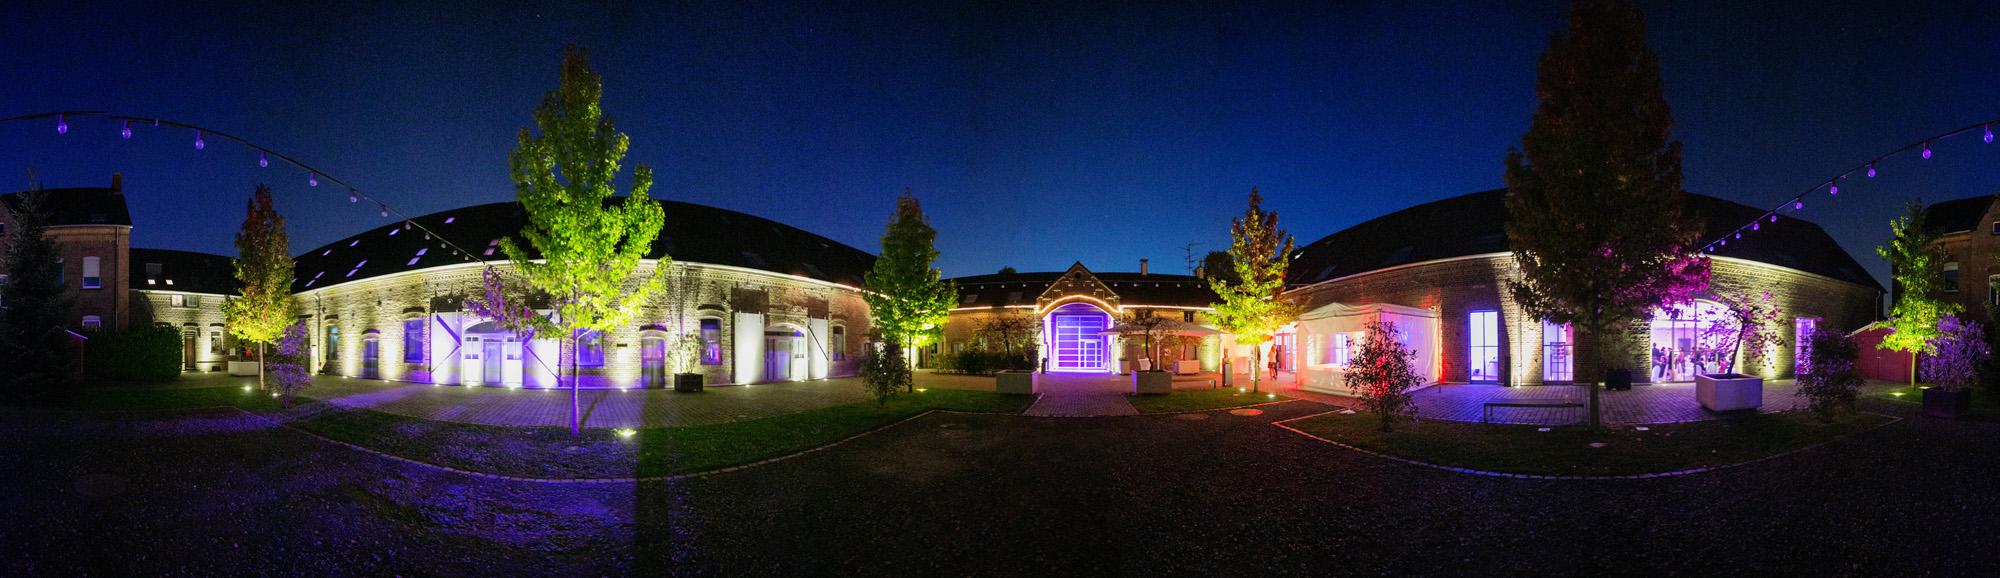 Hochzeit-Schloss-Bruehl_42.jpg